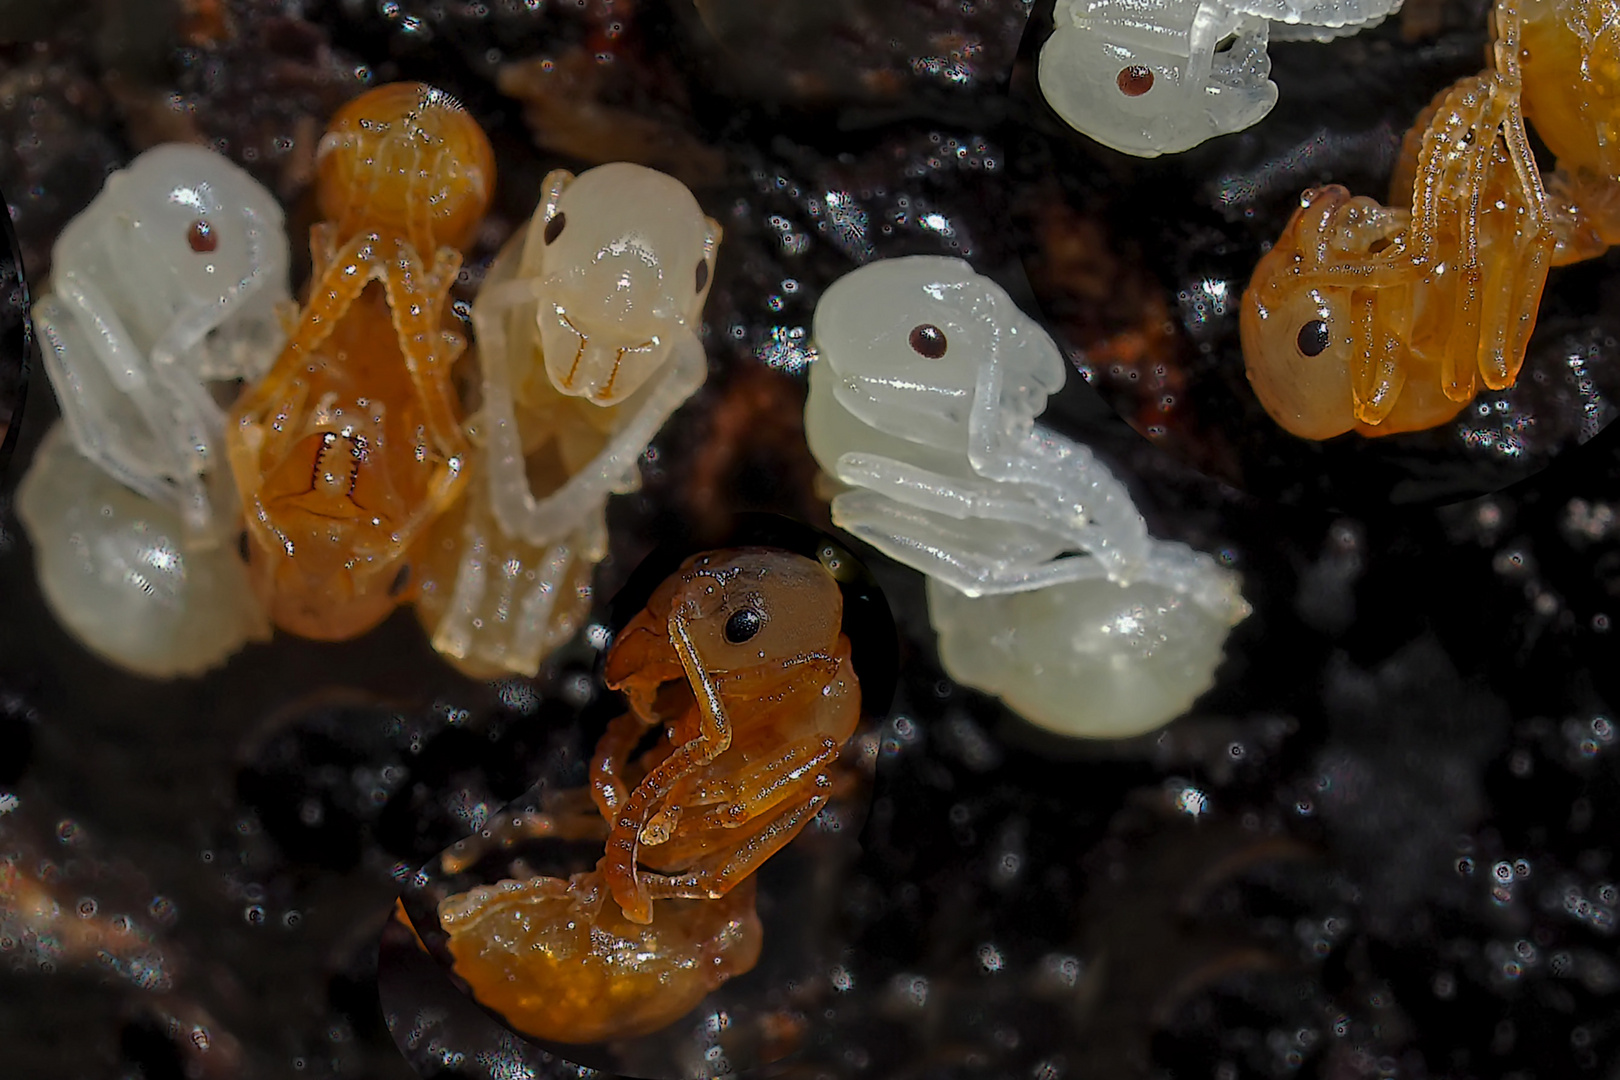 Einblick in die Säuglingsstation...  -  Bambins de fourmis rouges...